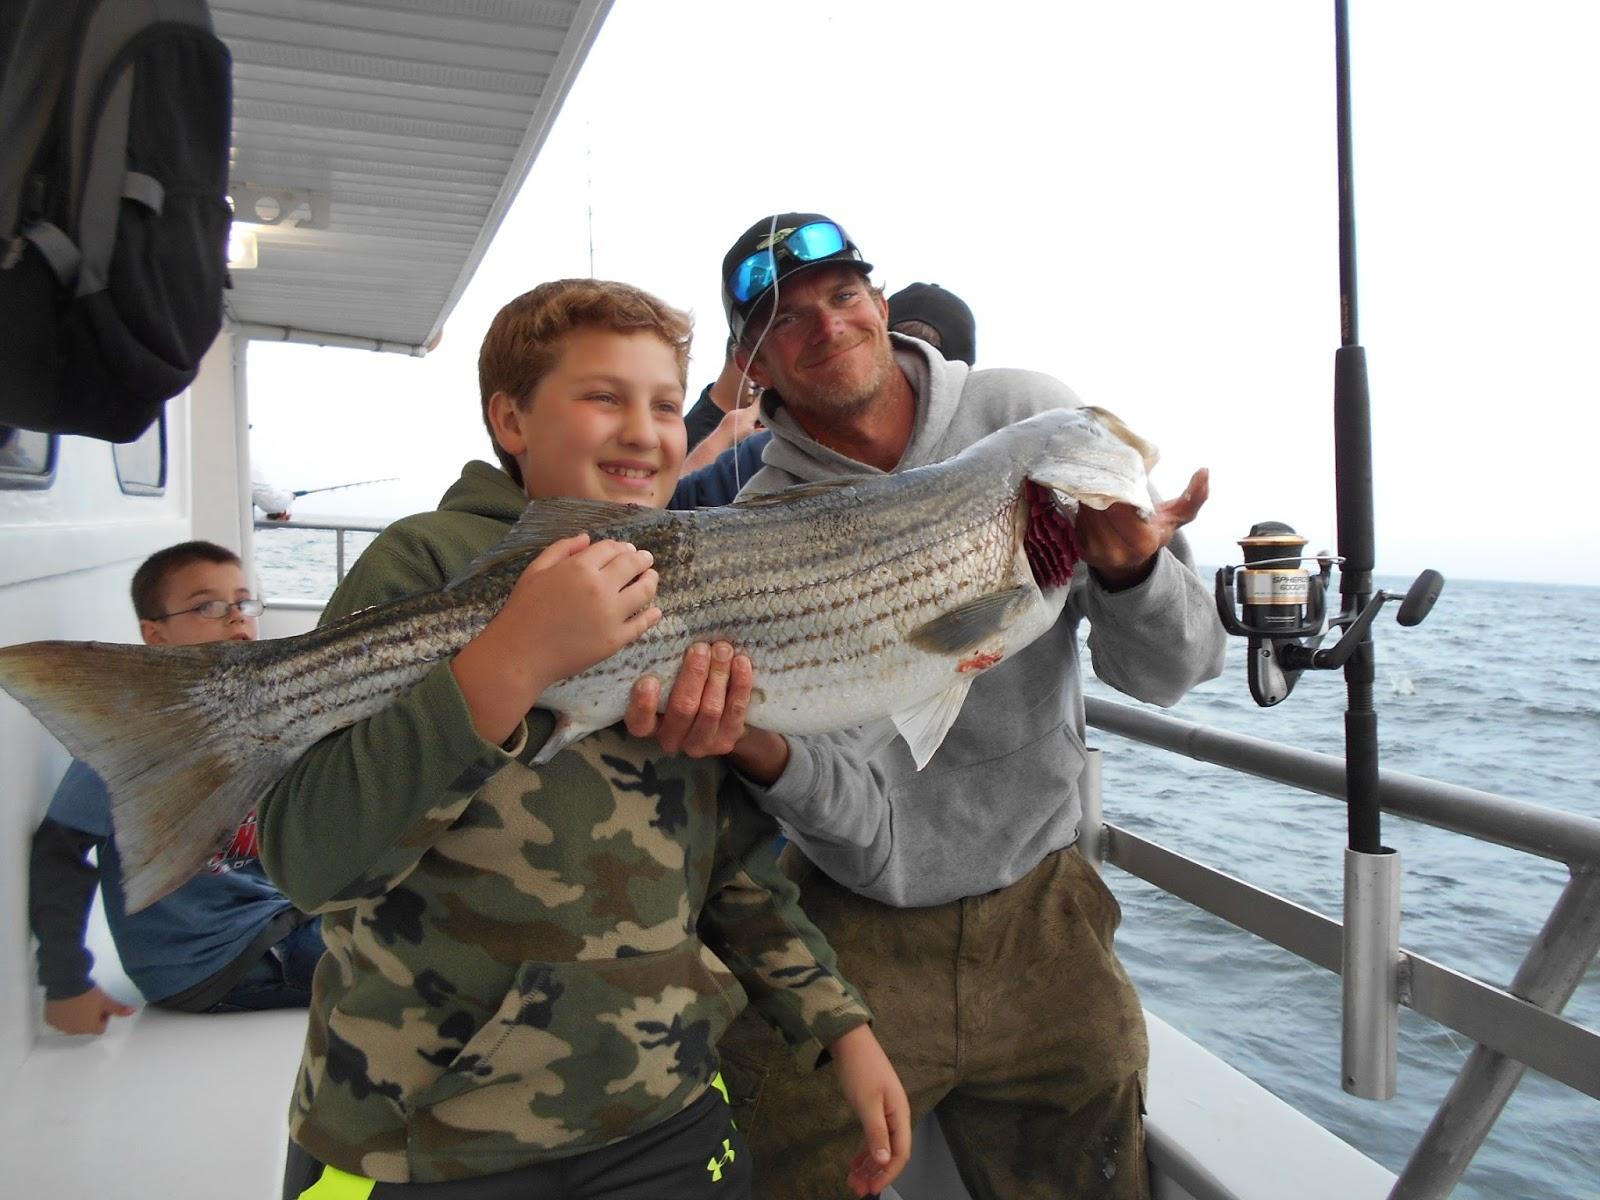 Nj salt fish 2016 06 05 captain cal belmar for Belmar nj fishing report